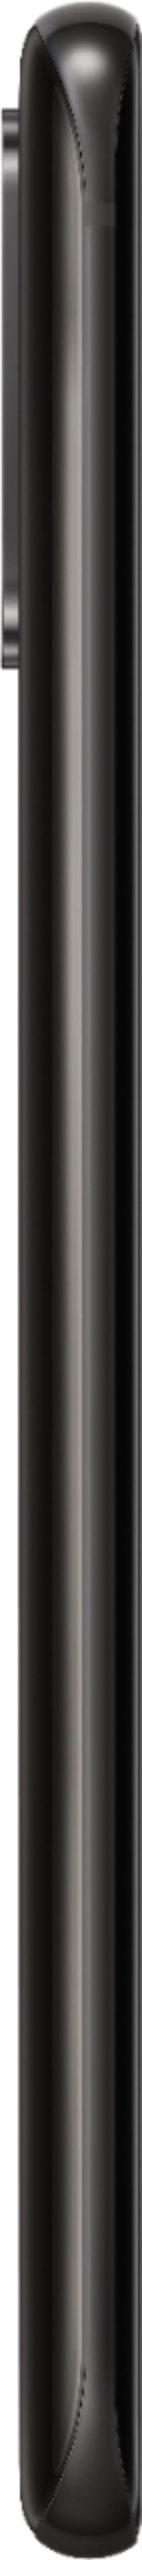 Samsung Galaxy S20+ DUAL (SM-G985F) Black - 5